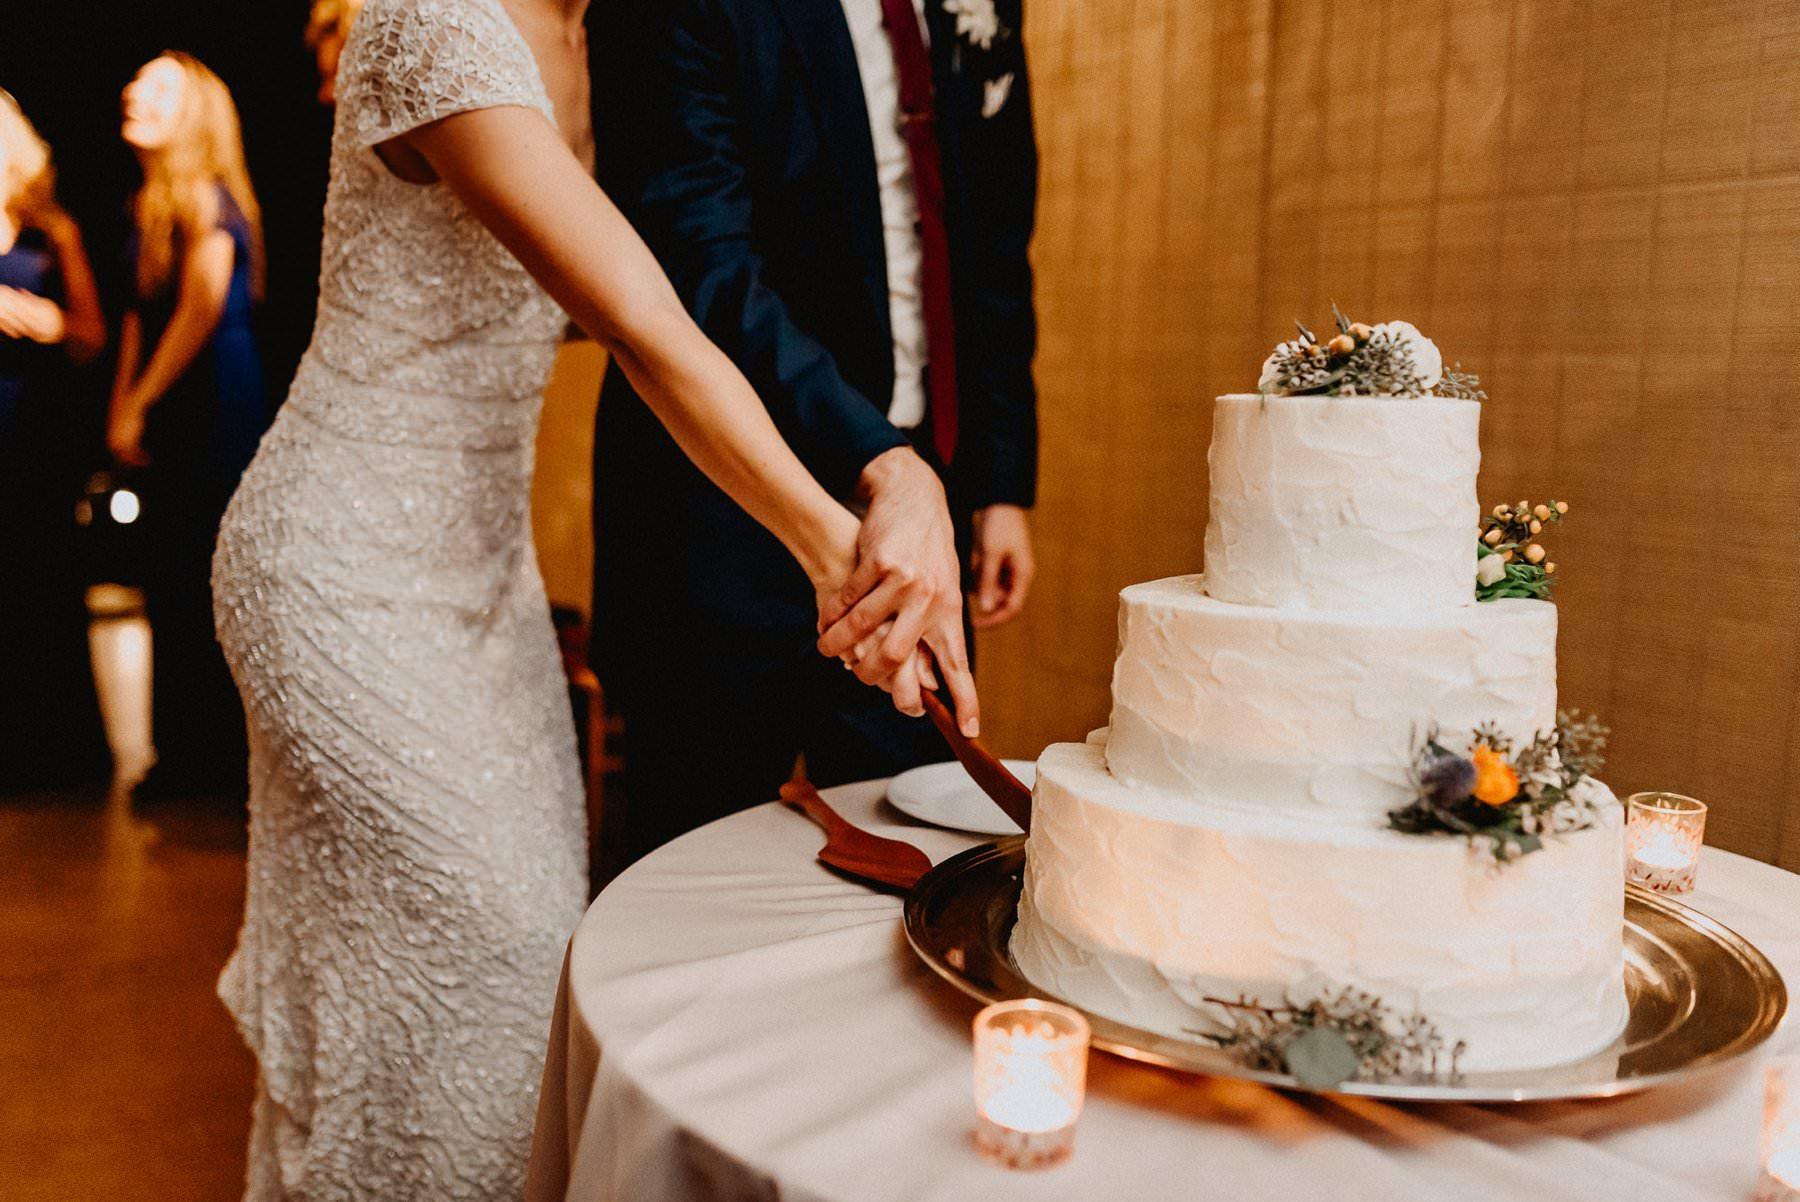 John_James_Audubon_Center_wedding-78.jpg